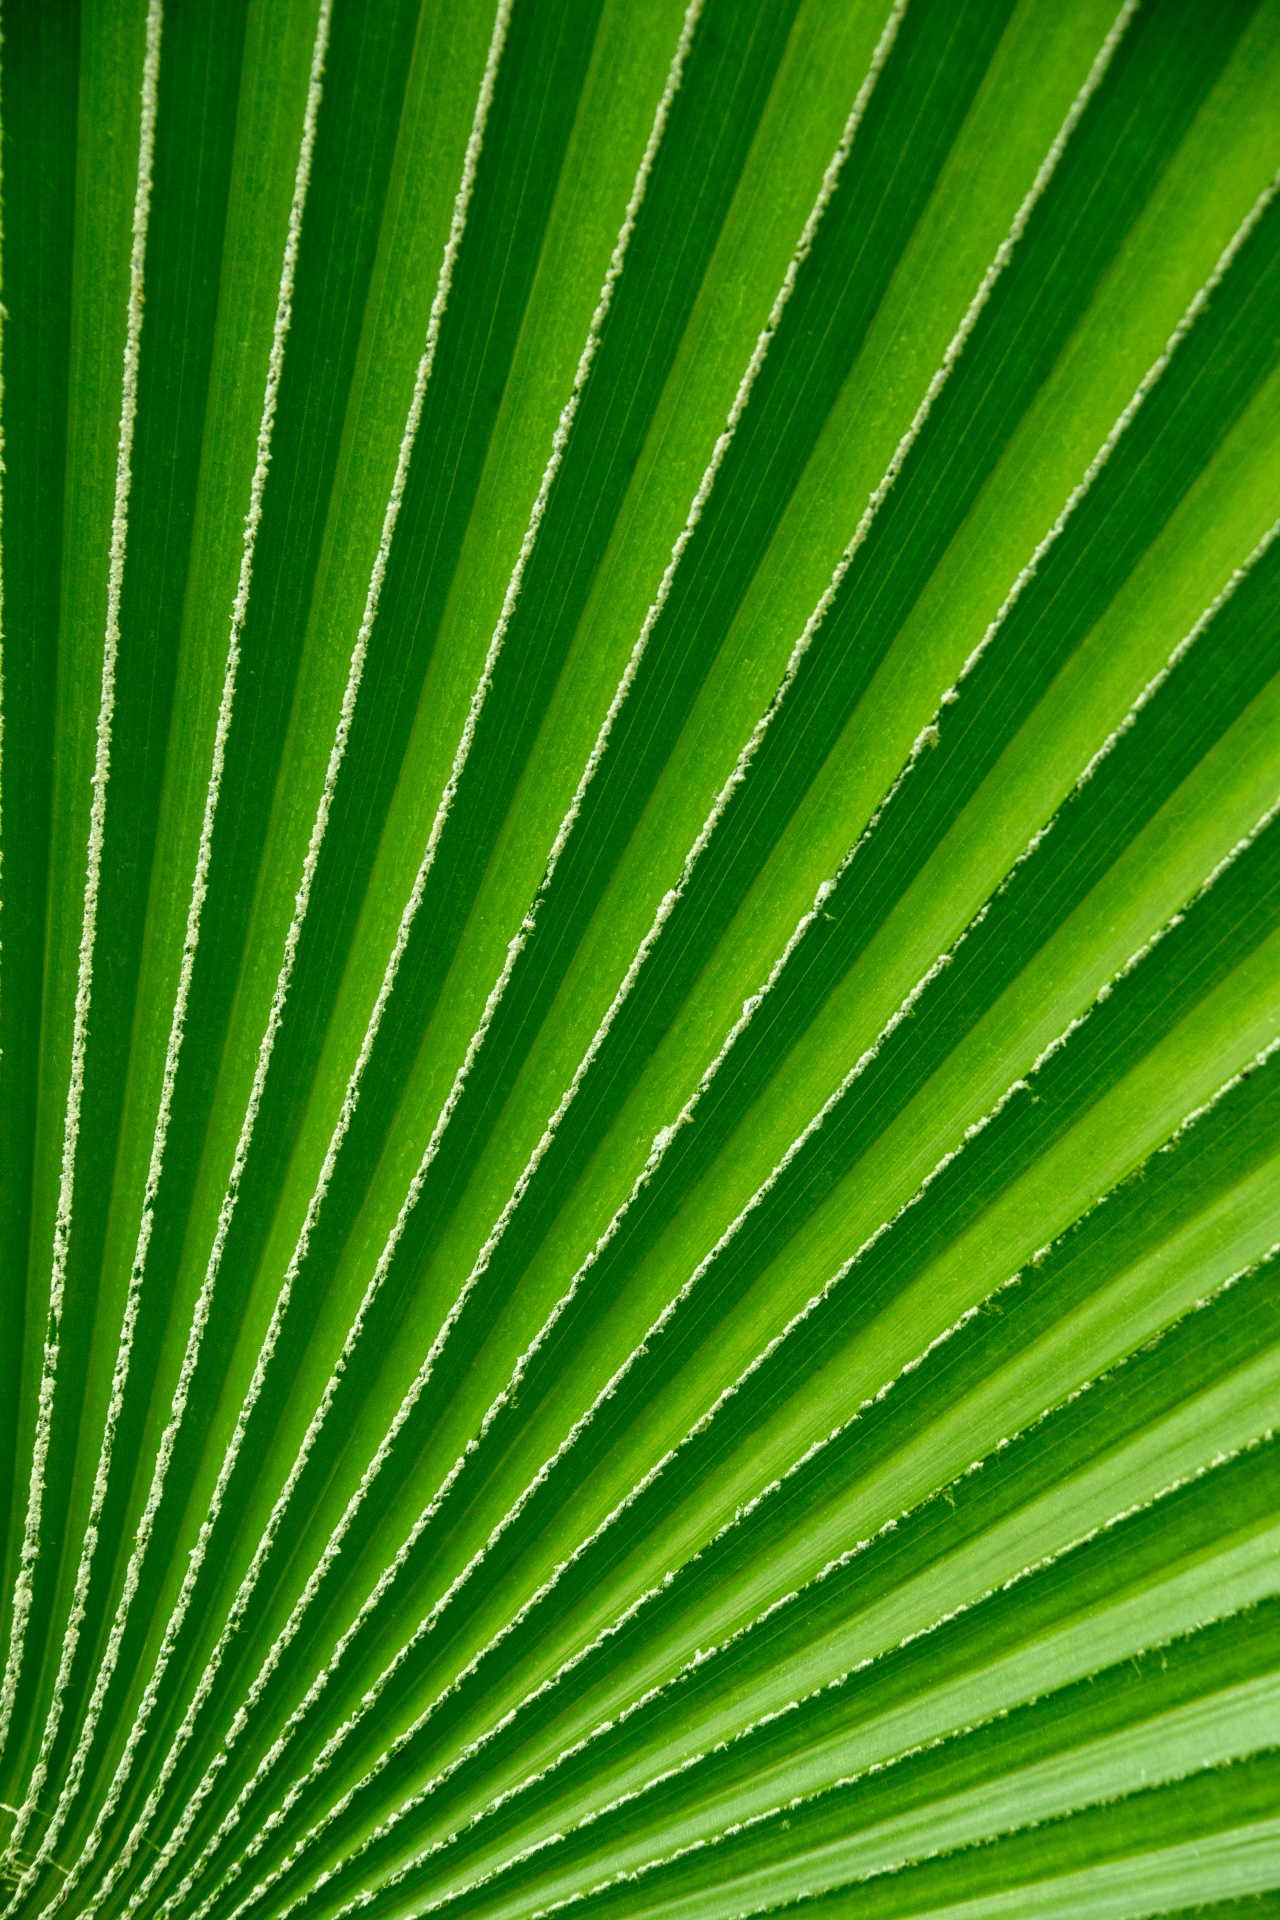 green-palm-tree-leaf-1523972823mku.jpg